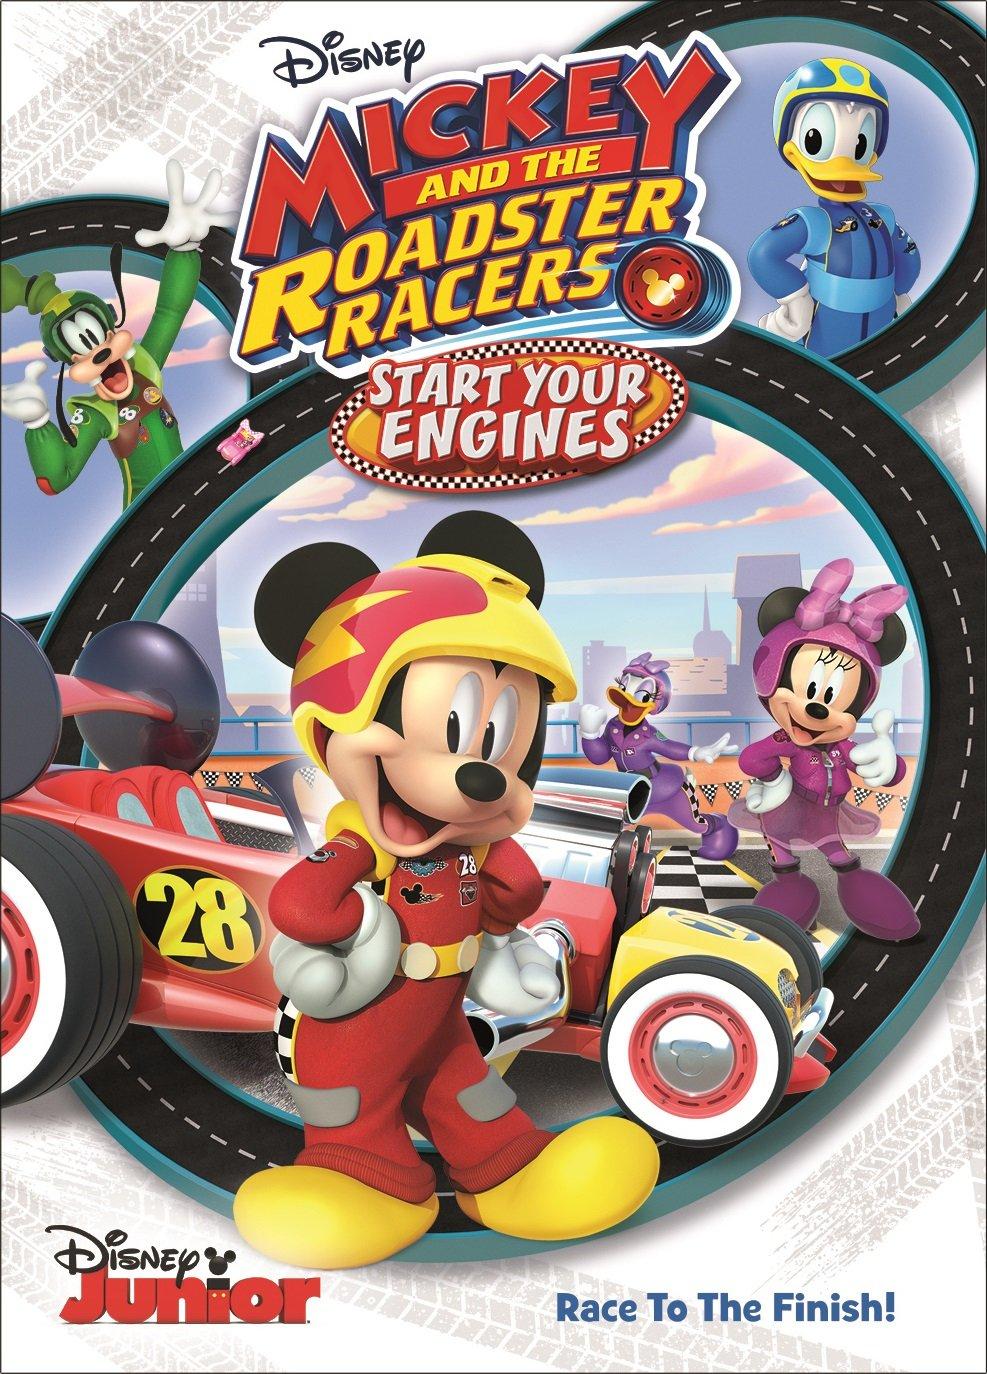 Amazon Com Mickey And The Roadster Racers Start Your Engines Bret Iwan Russi Taylor Bill Farmer Daniel Ross Tress Macneille Nika Futterman Movies Tv